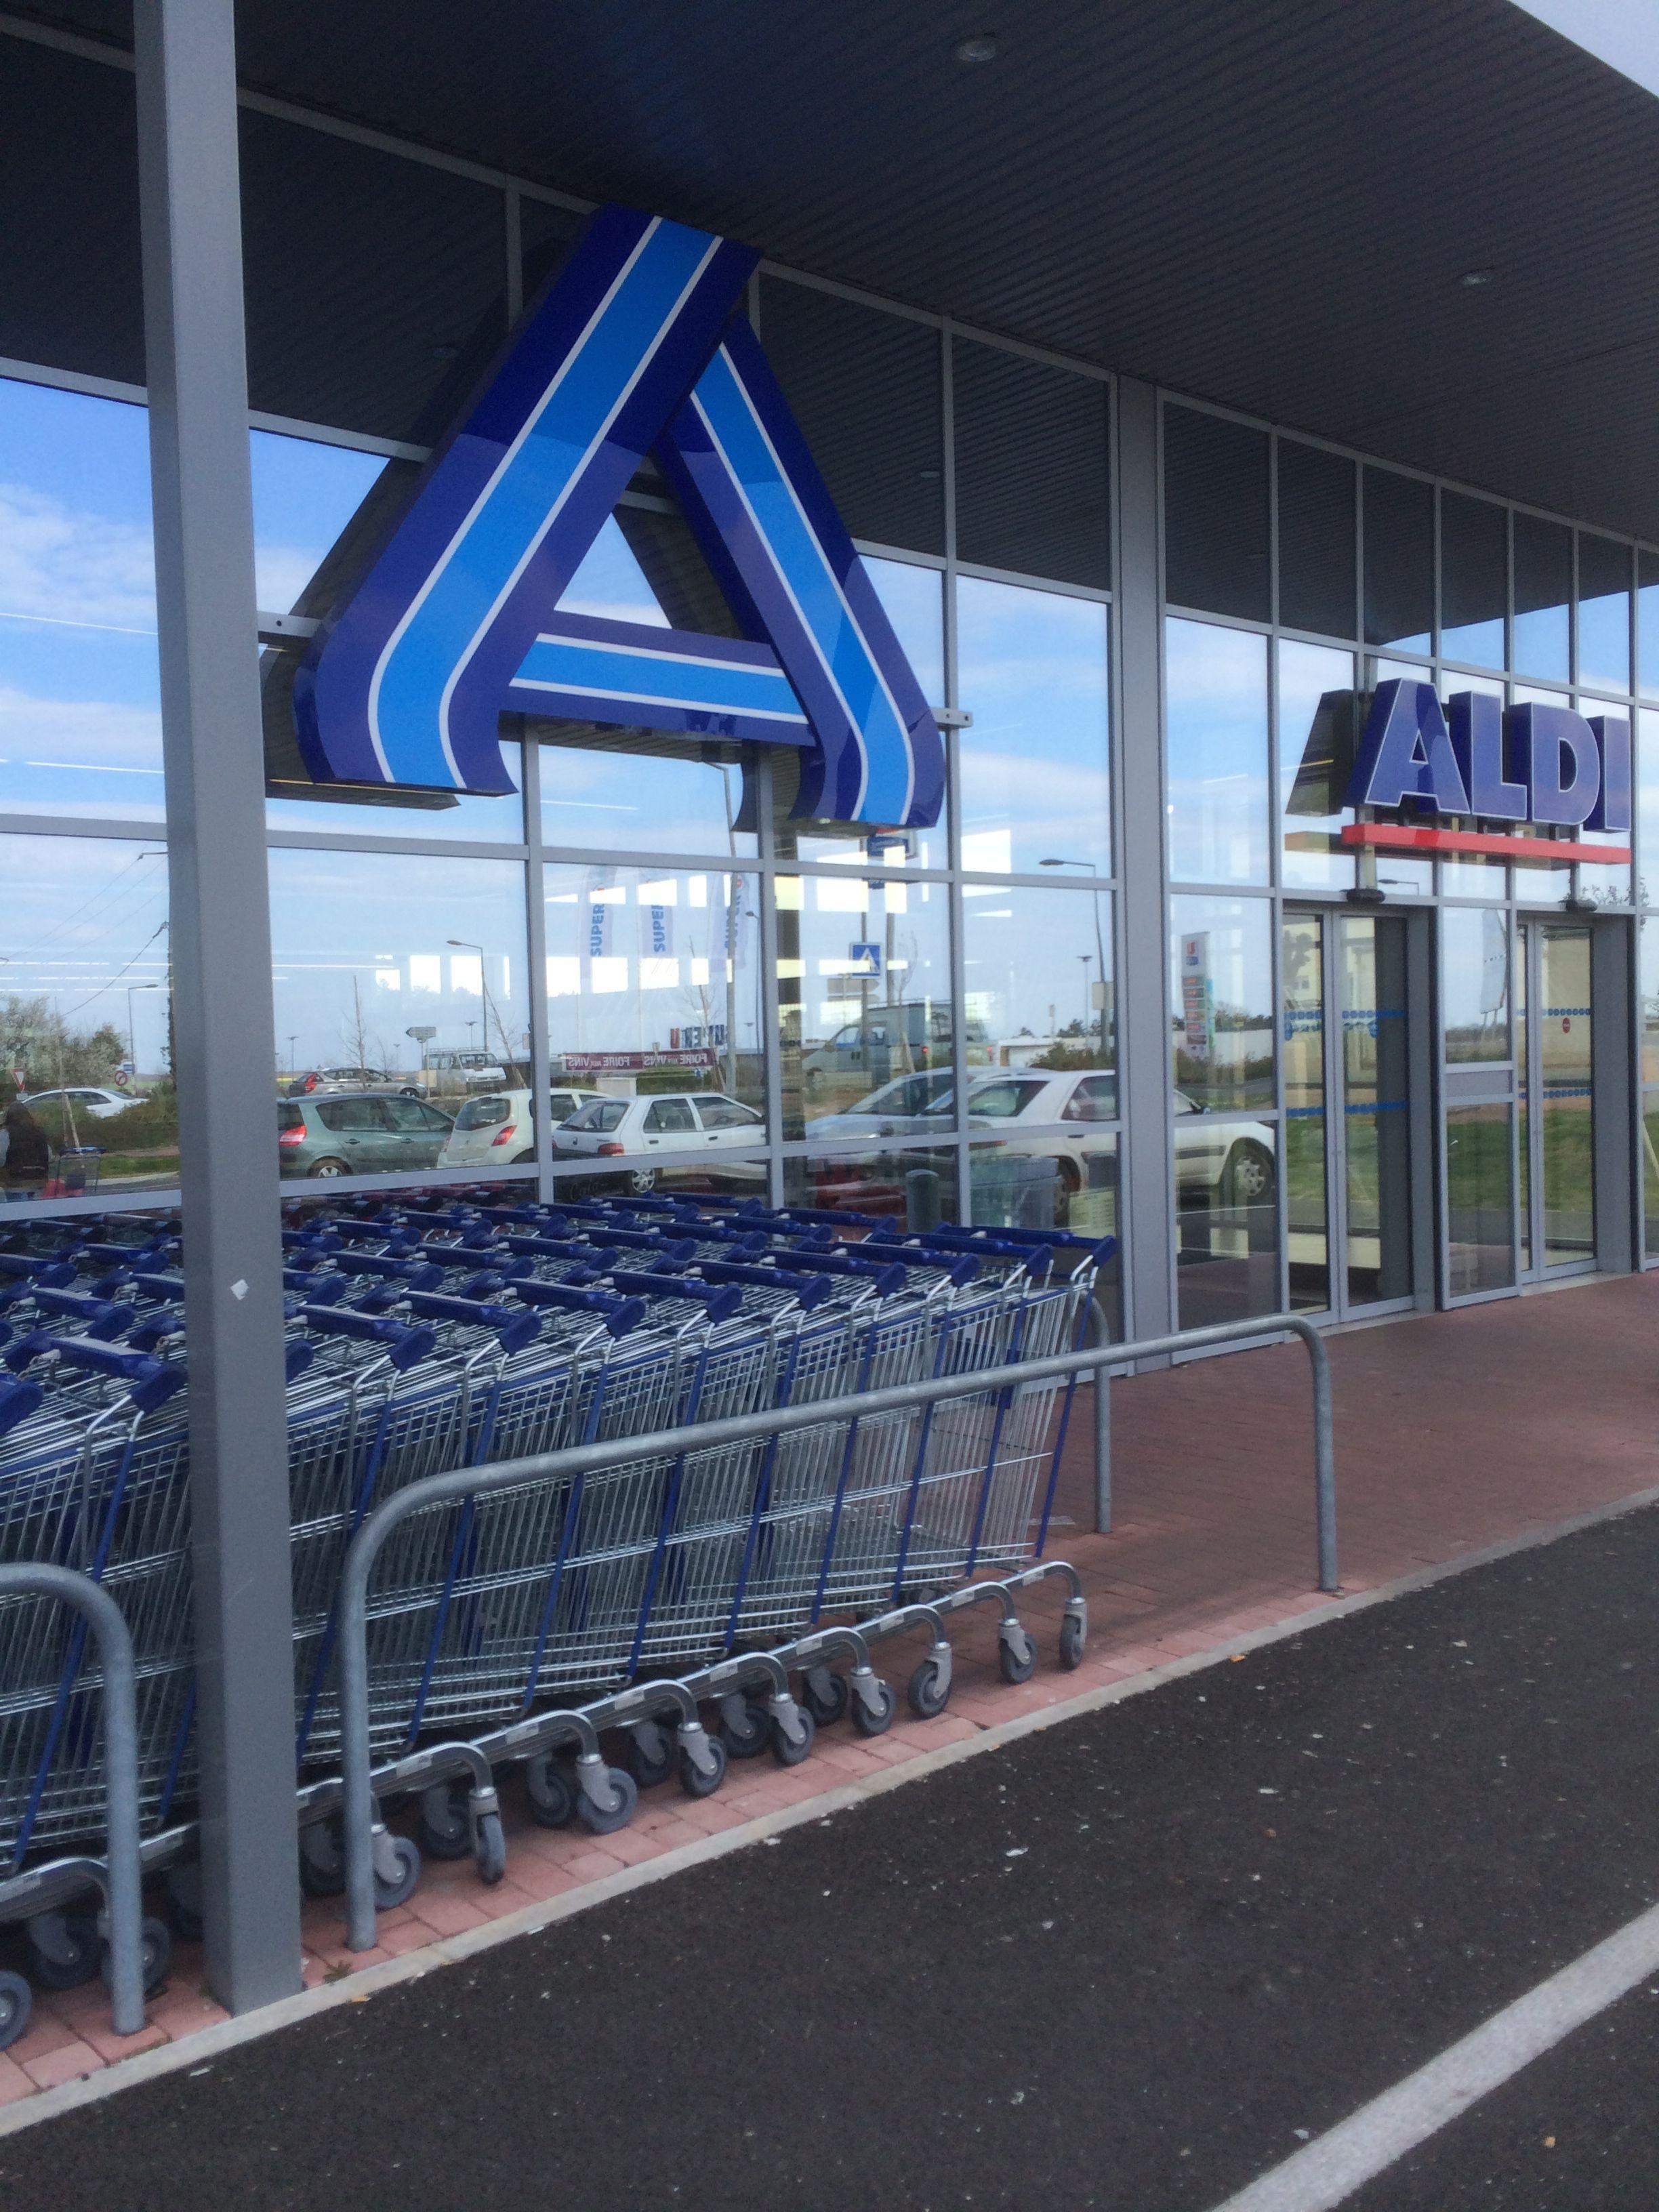 Aldi France Grocery Retail Supermarket Value